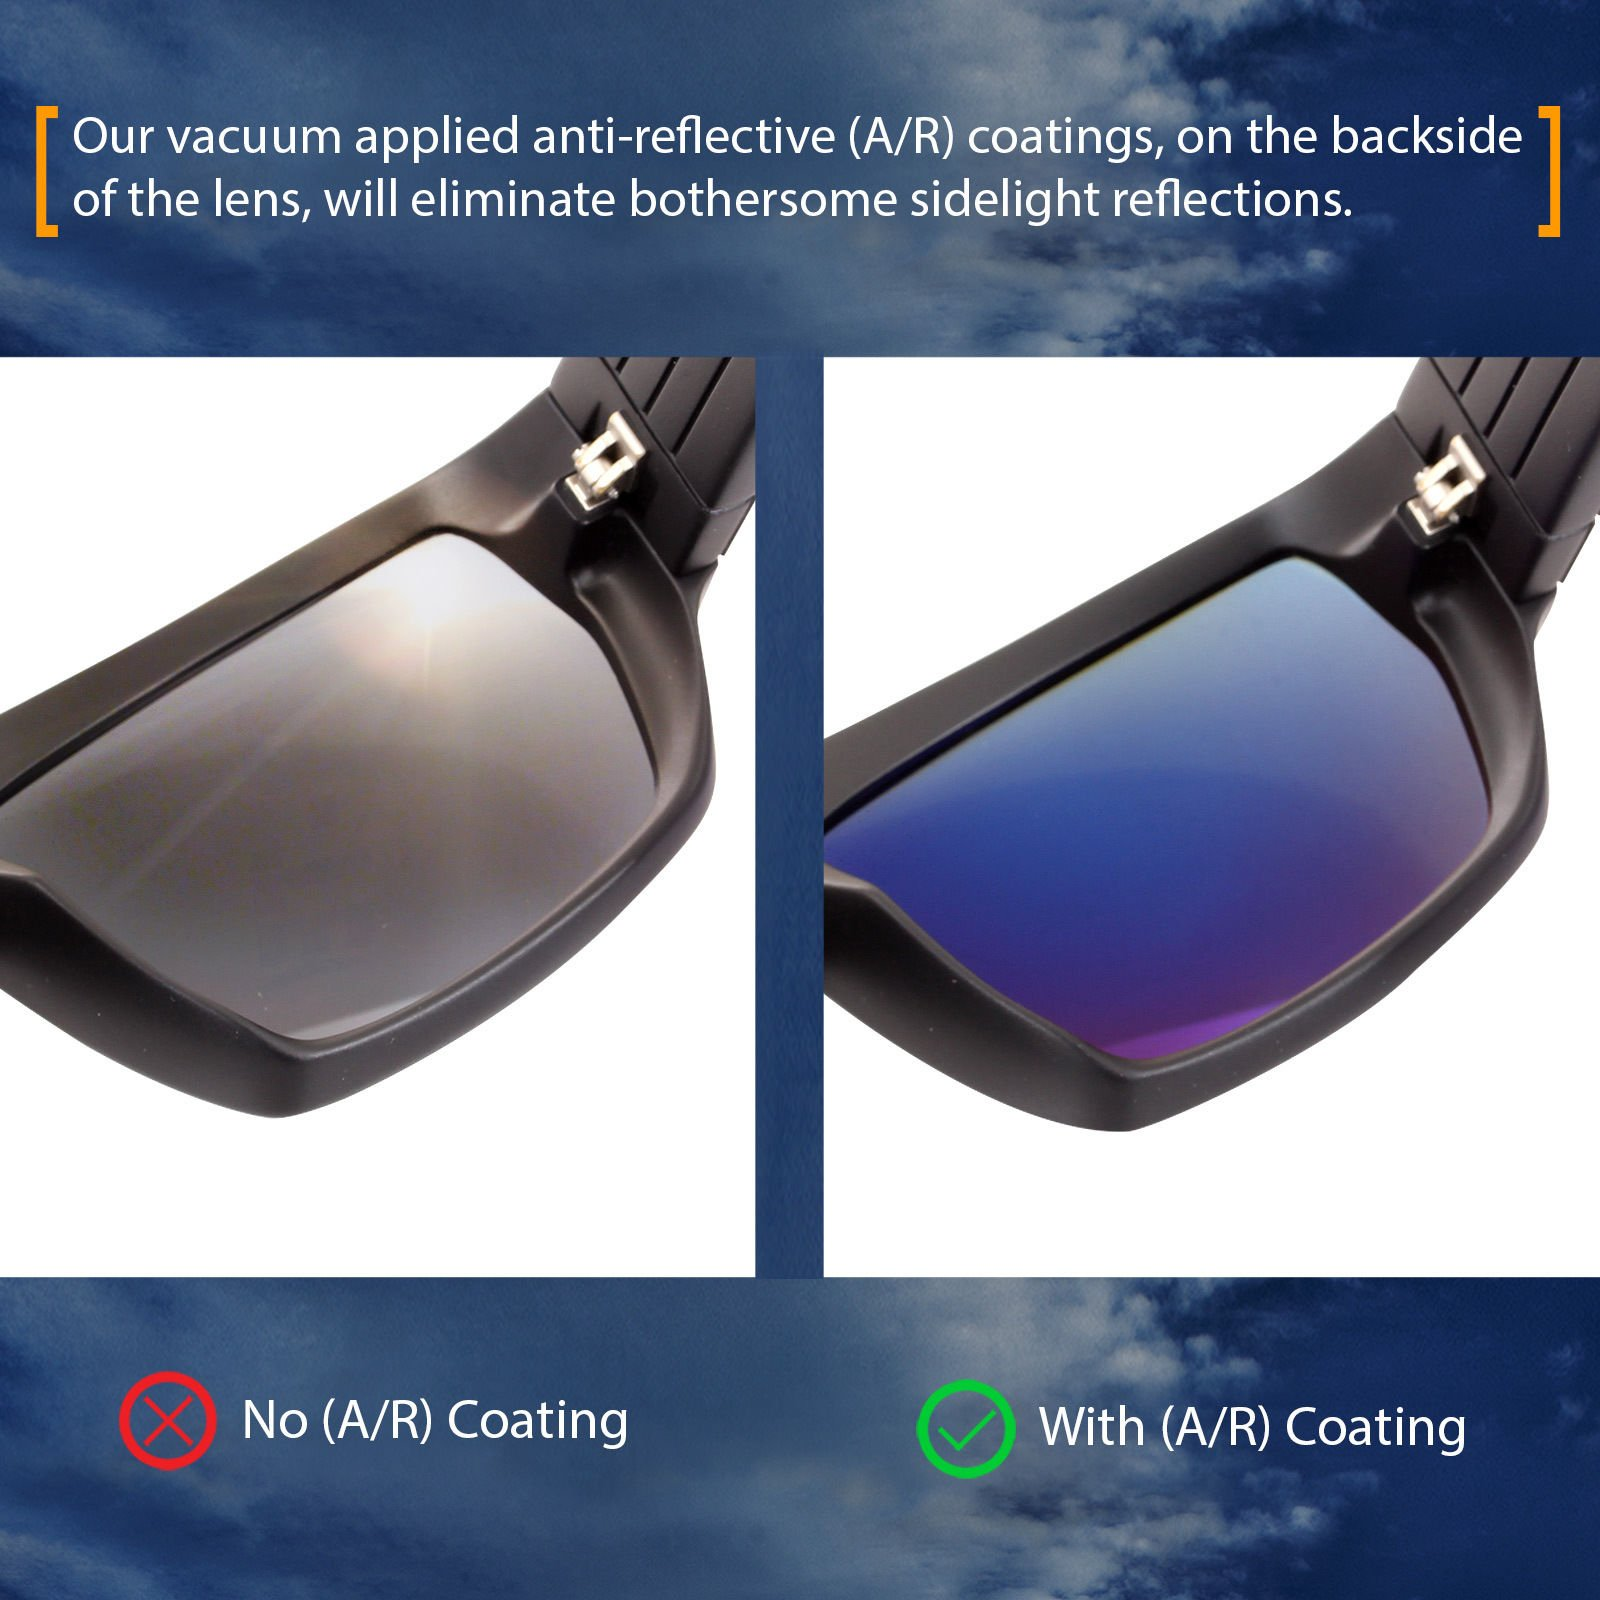 b6e4514e517 Polarized IKON Replacement Lenses for Oakley Twoface (OO9189) Sunglasses -  Deep Blue Mirror - Twoface-DeepBlueMirror   Replacement Sunglass Lenses ...